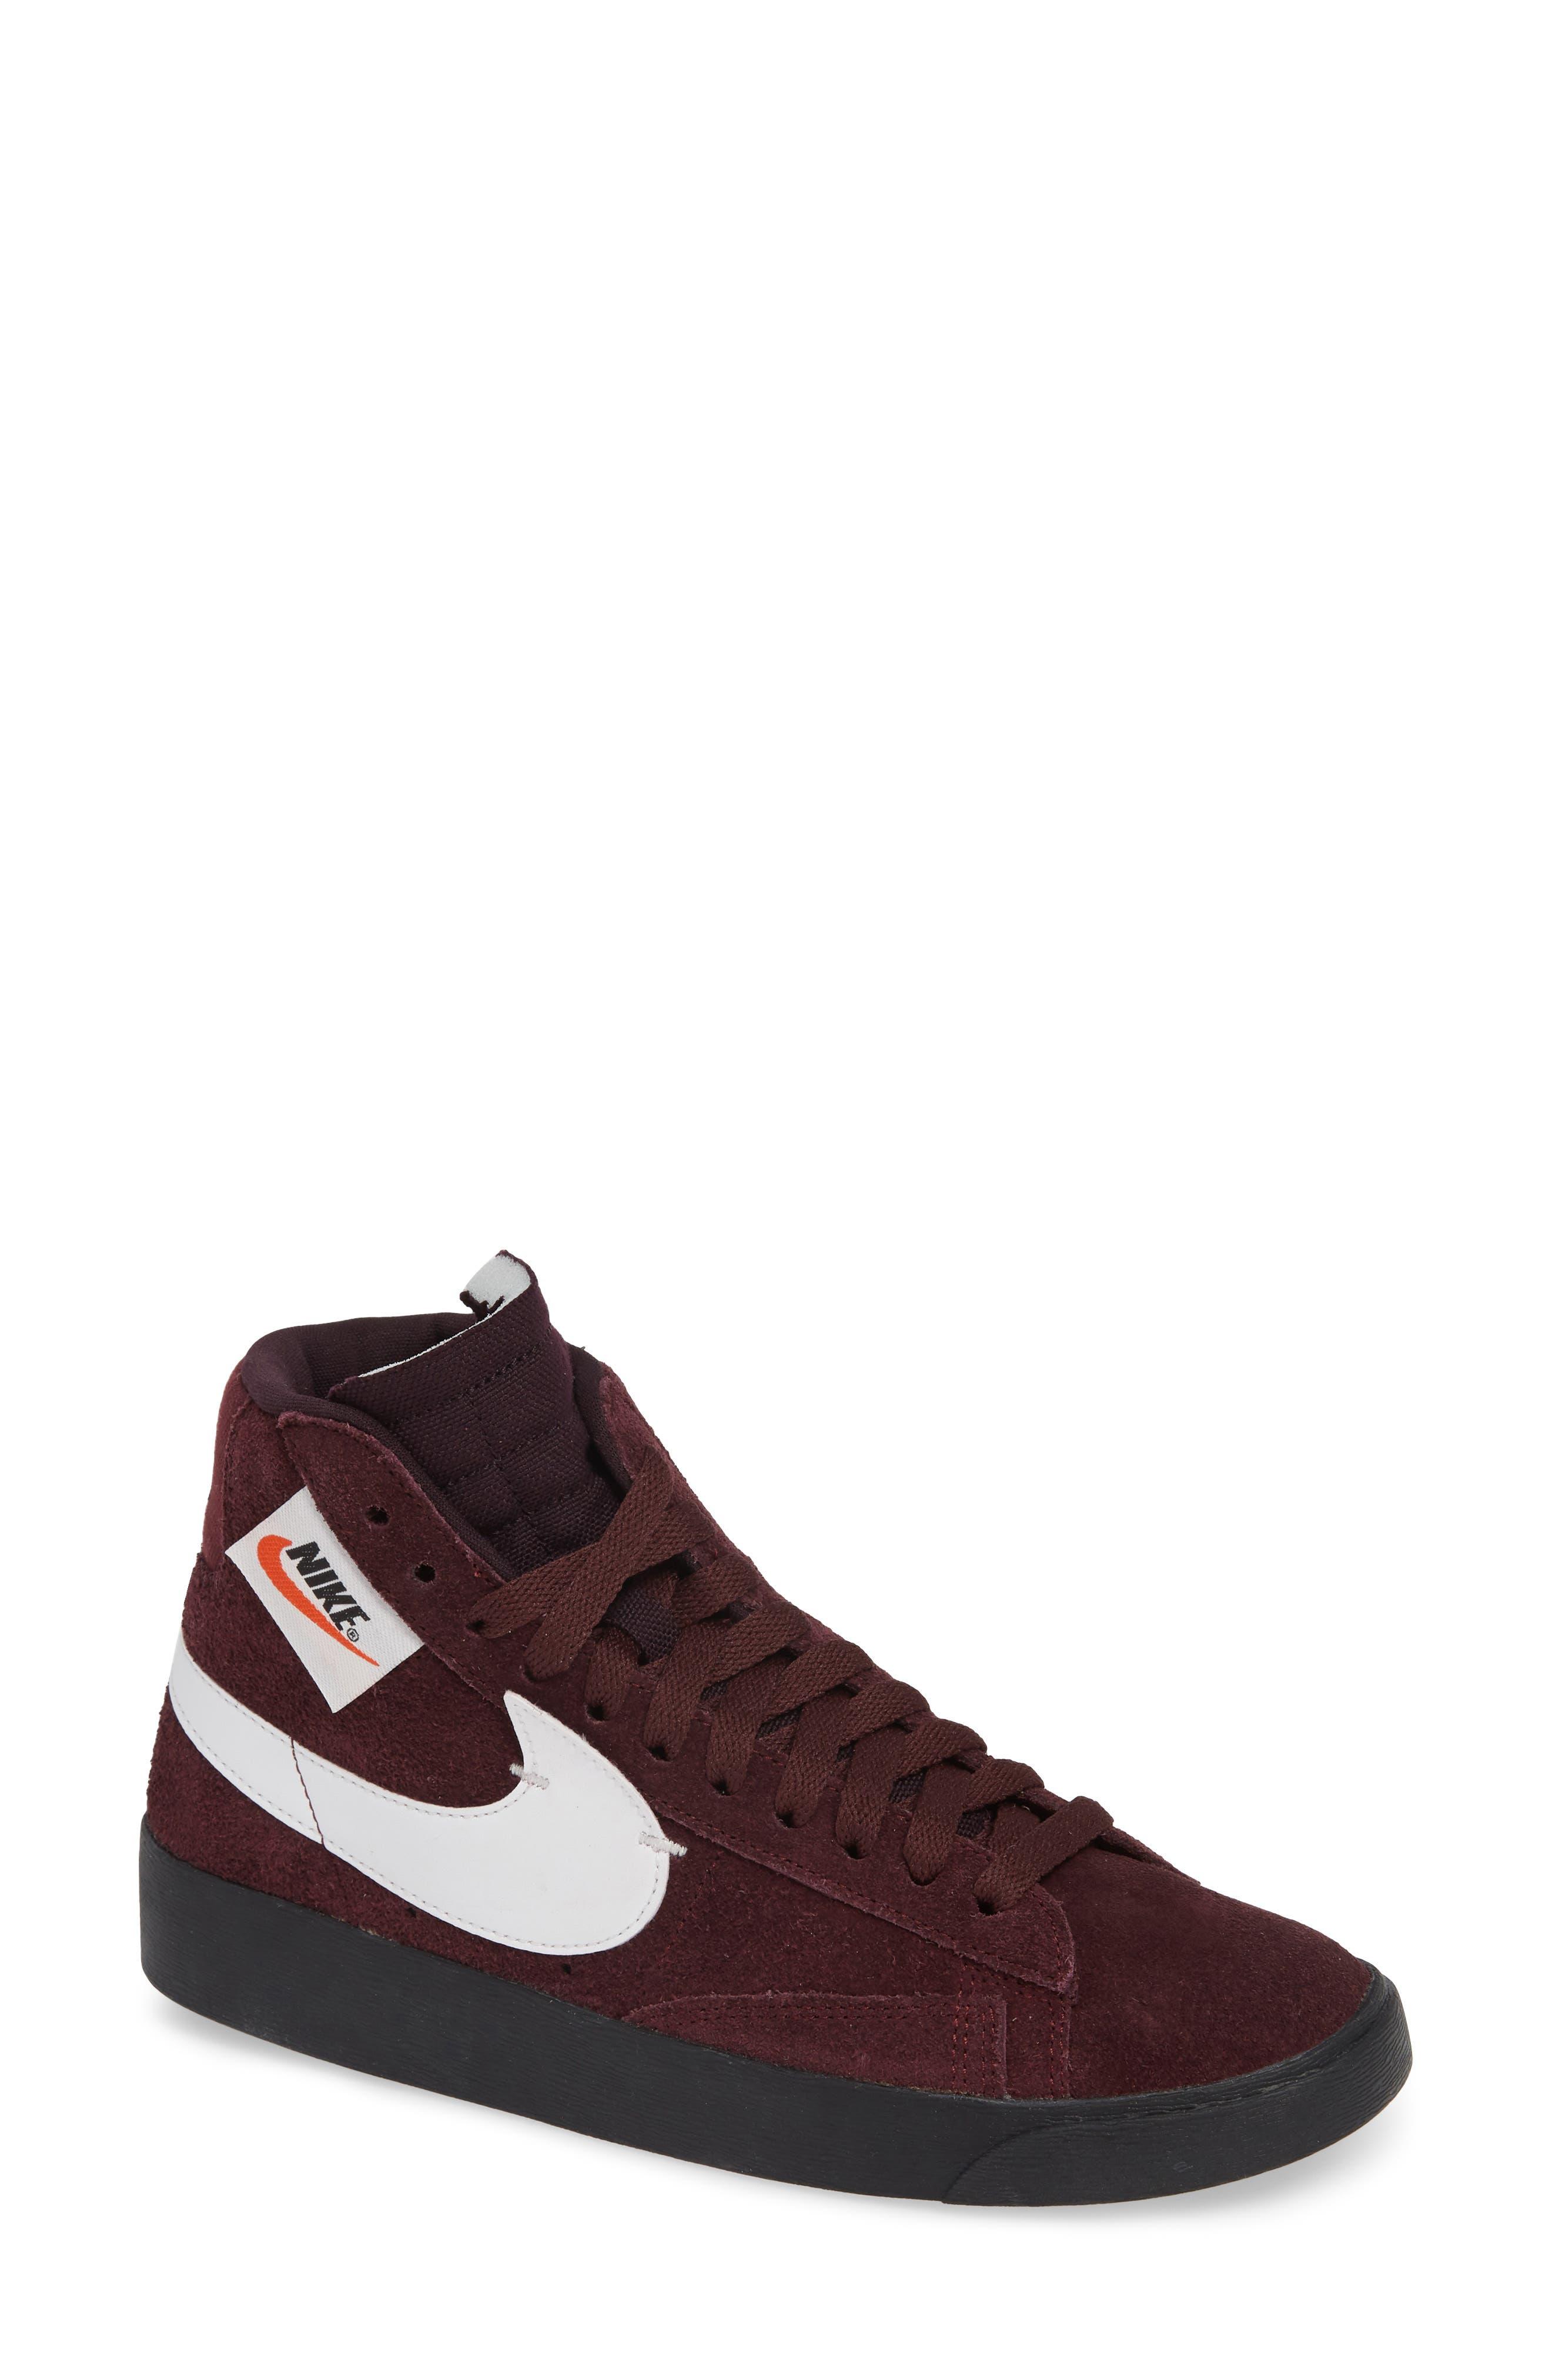 NIKE, Blazer Mid Rebel Sneaker, Main thumbnail 1, color, 930